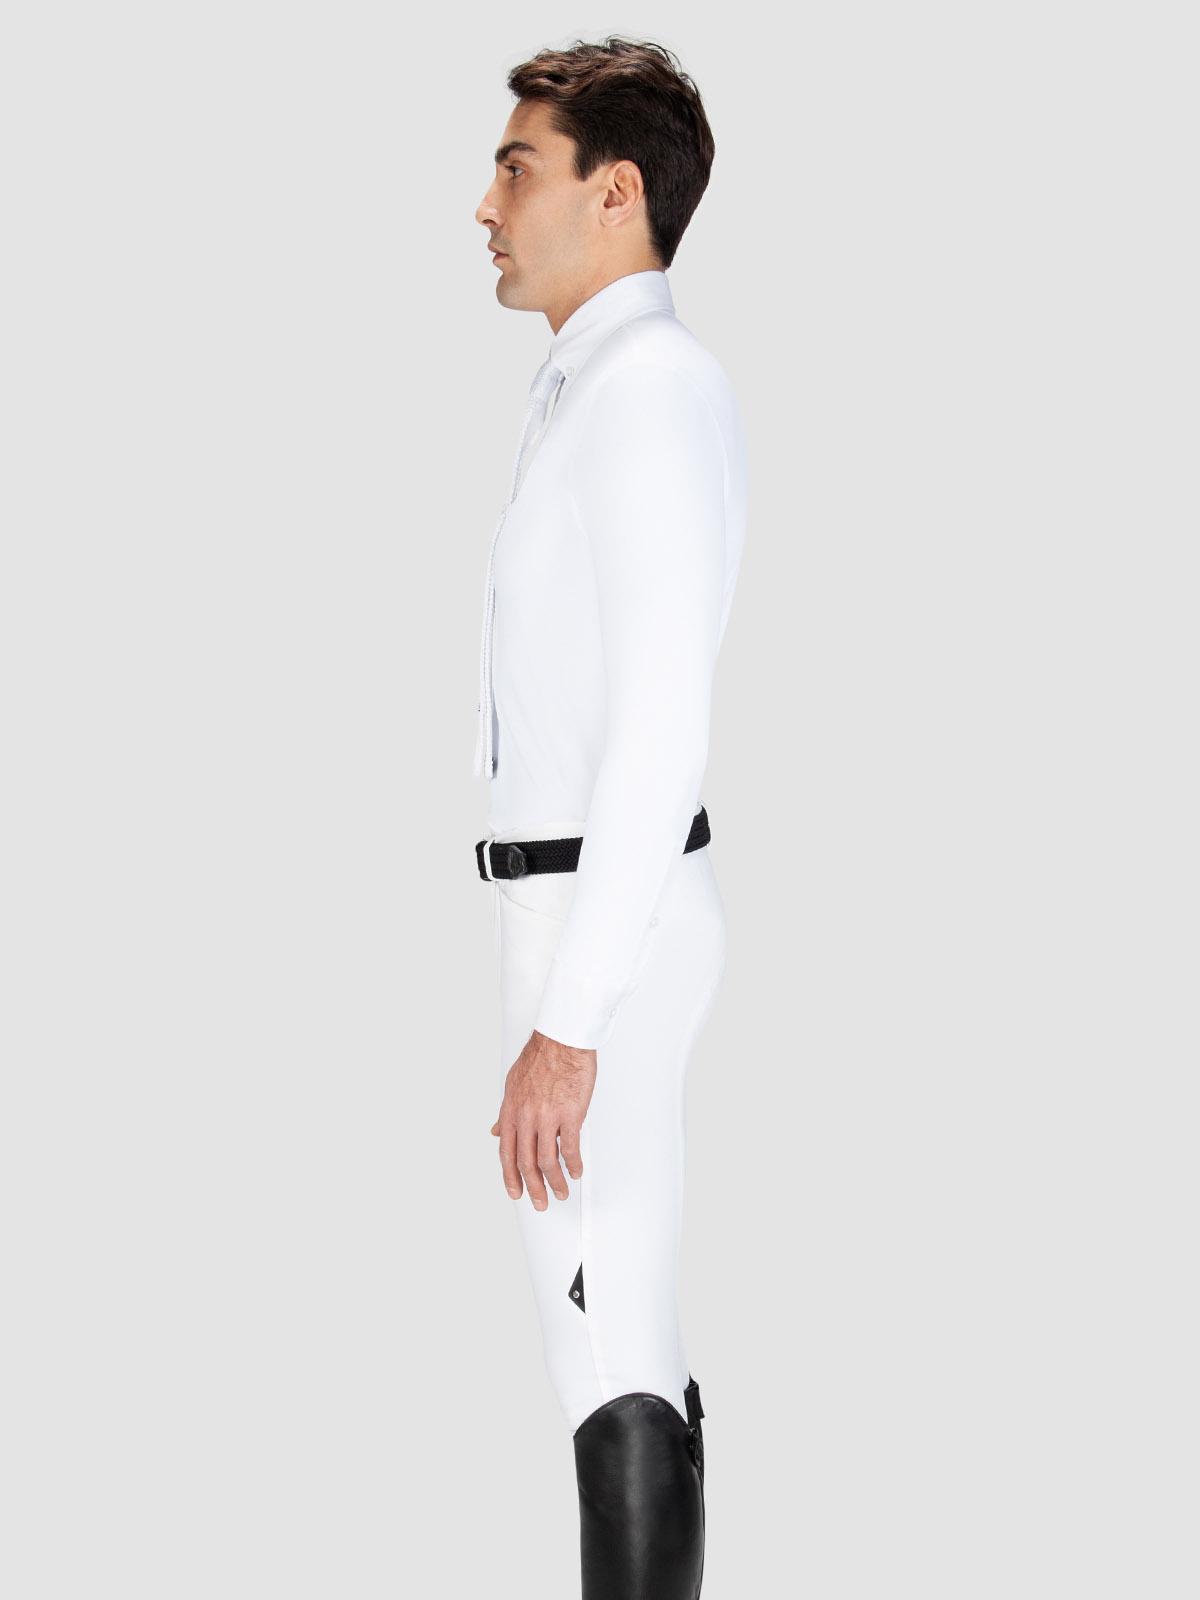 DAVID - Men's Long Sleeve Show Shirt 2